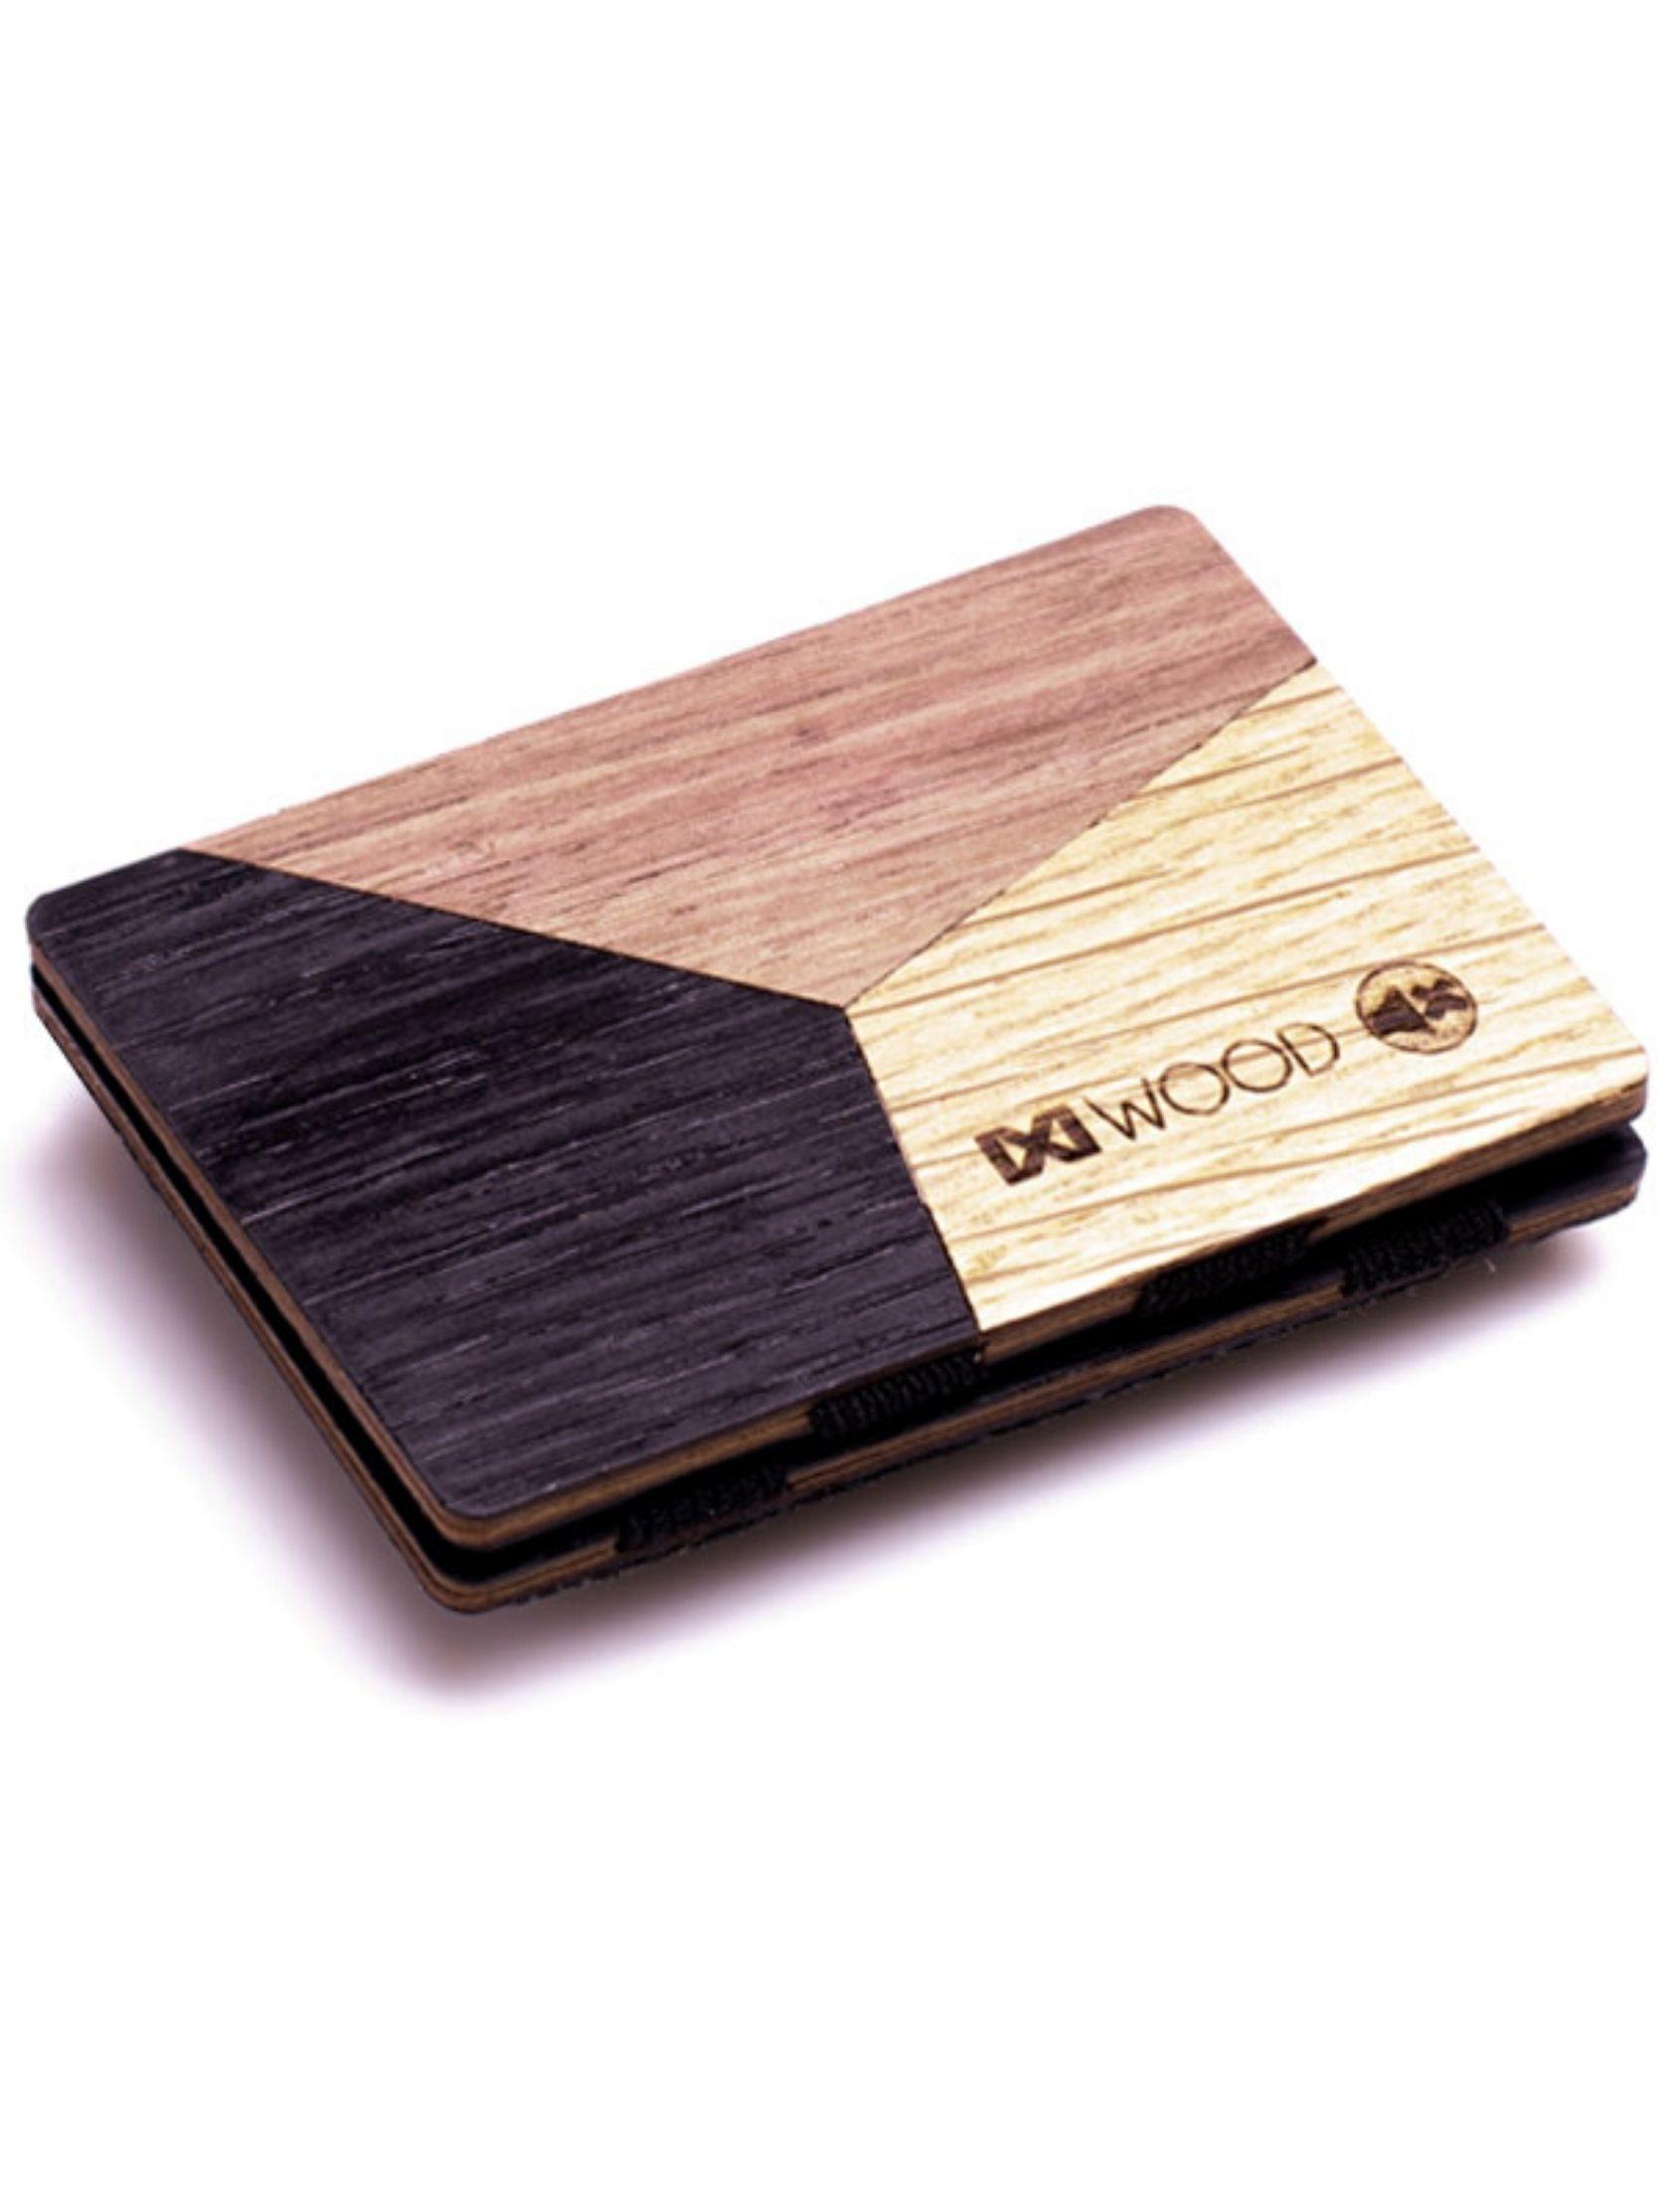 Cartera de madera con figuras geometricas en varios colores de ixi wood